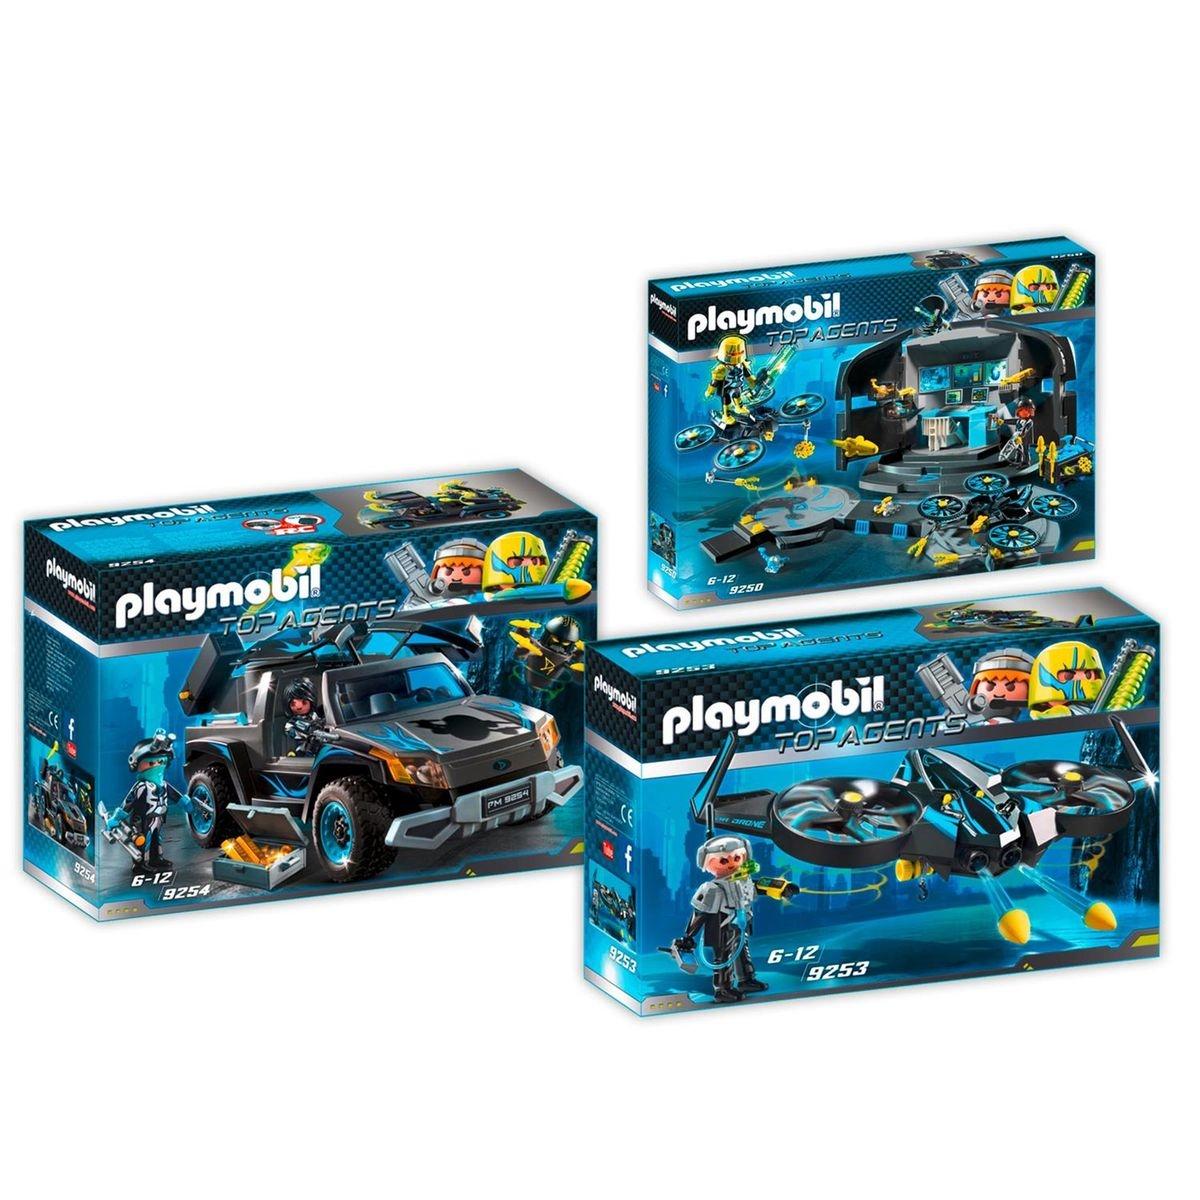 PLAYMOBIL 9250-53-54 Top Agents - 3 boîtes - 9250+9253+9254